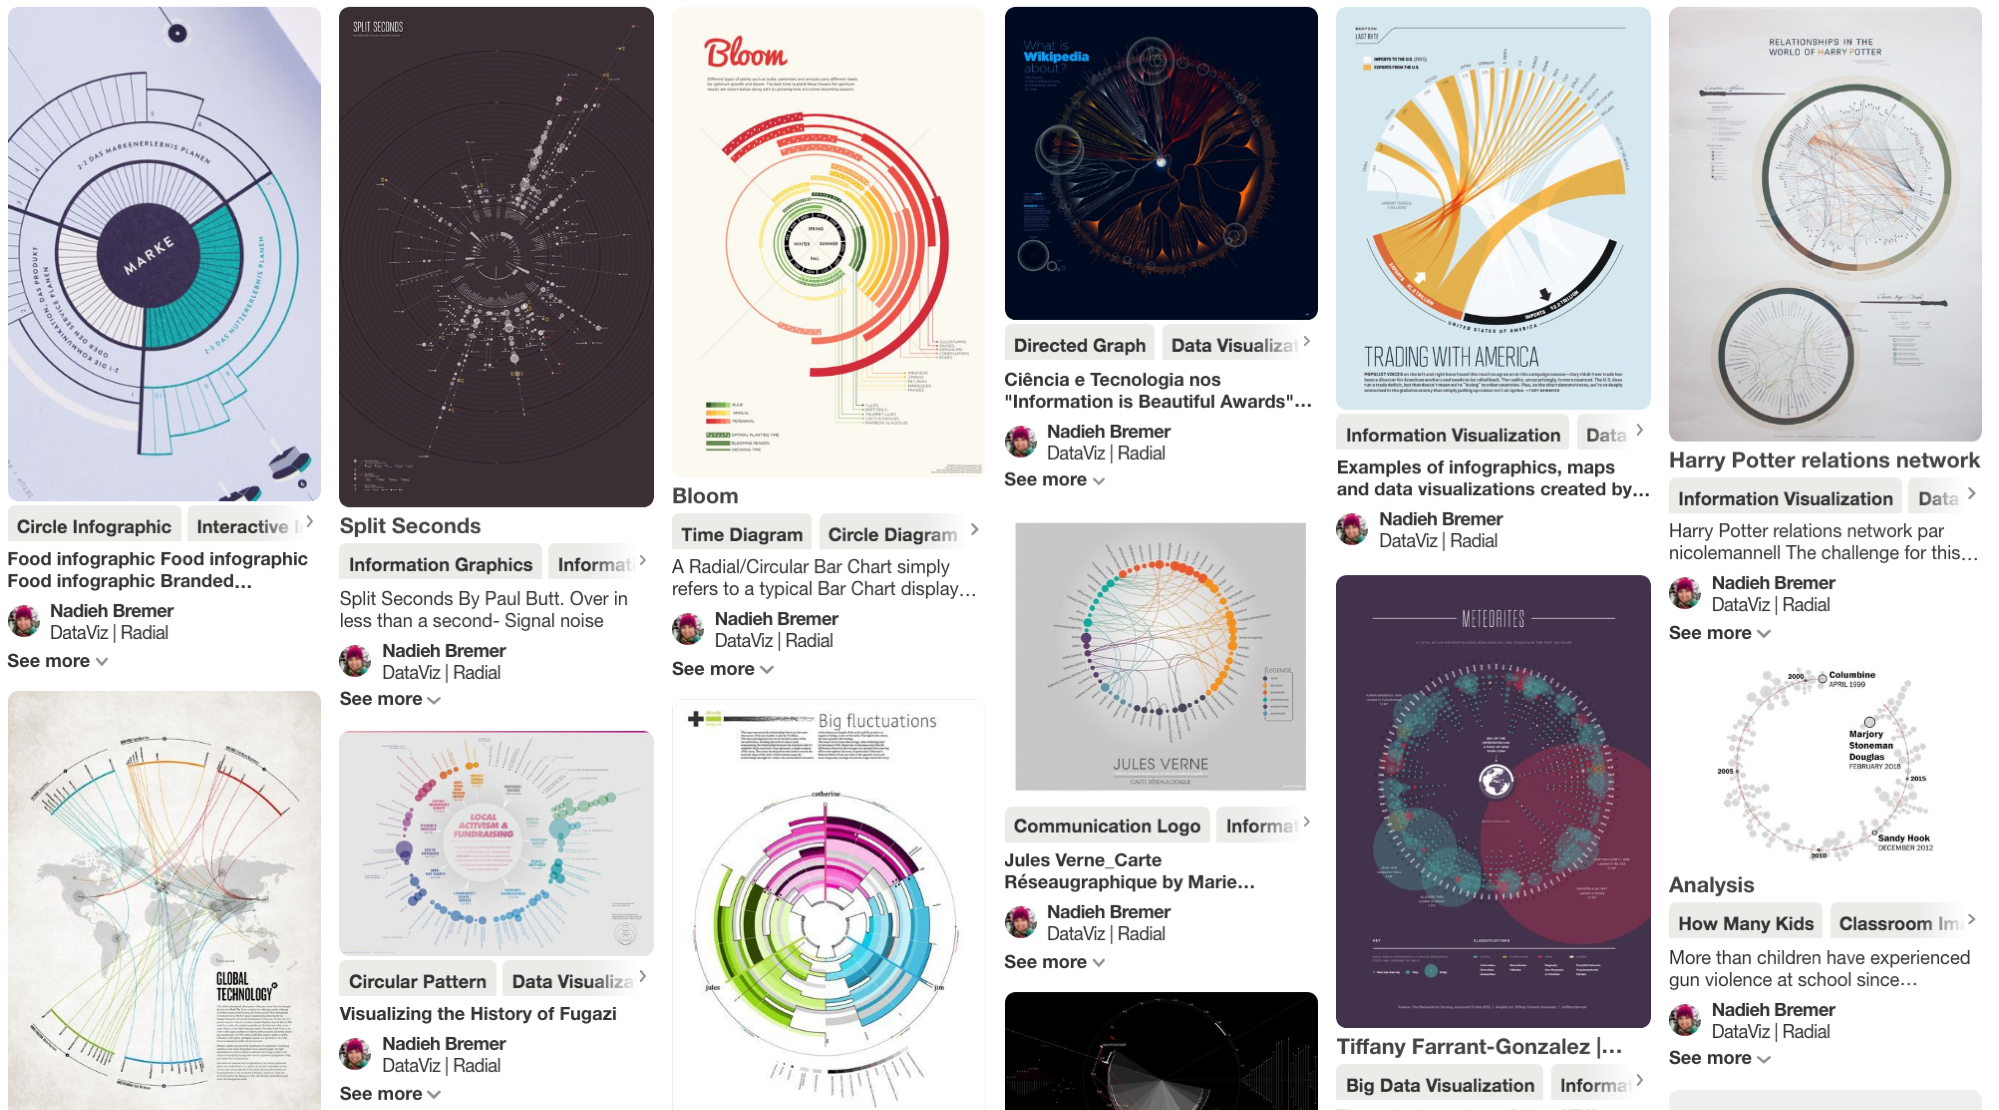 Sampling Nadieh Bremer's  Data Viz   Radial  collection on Pinterest